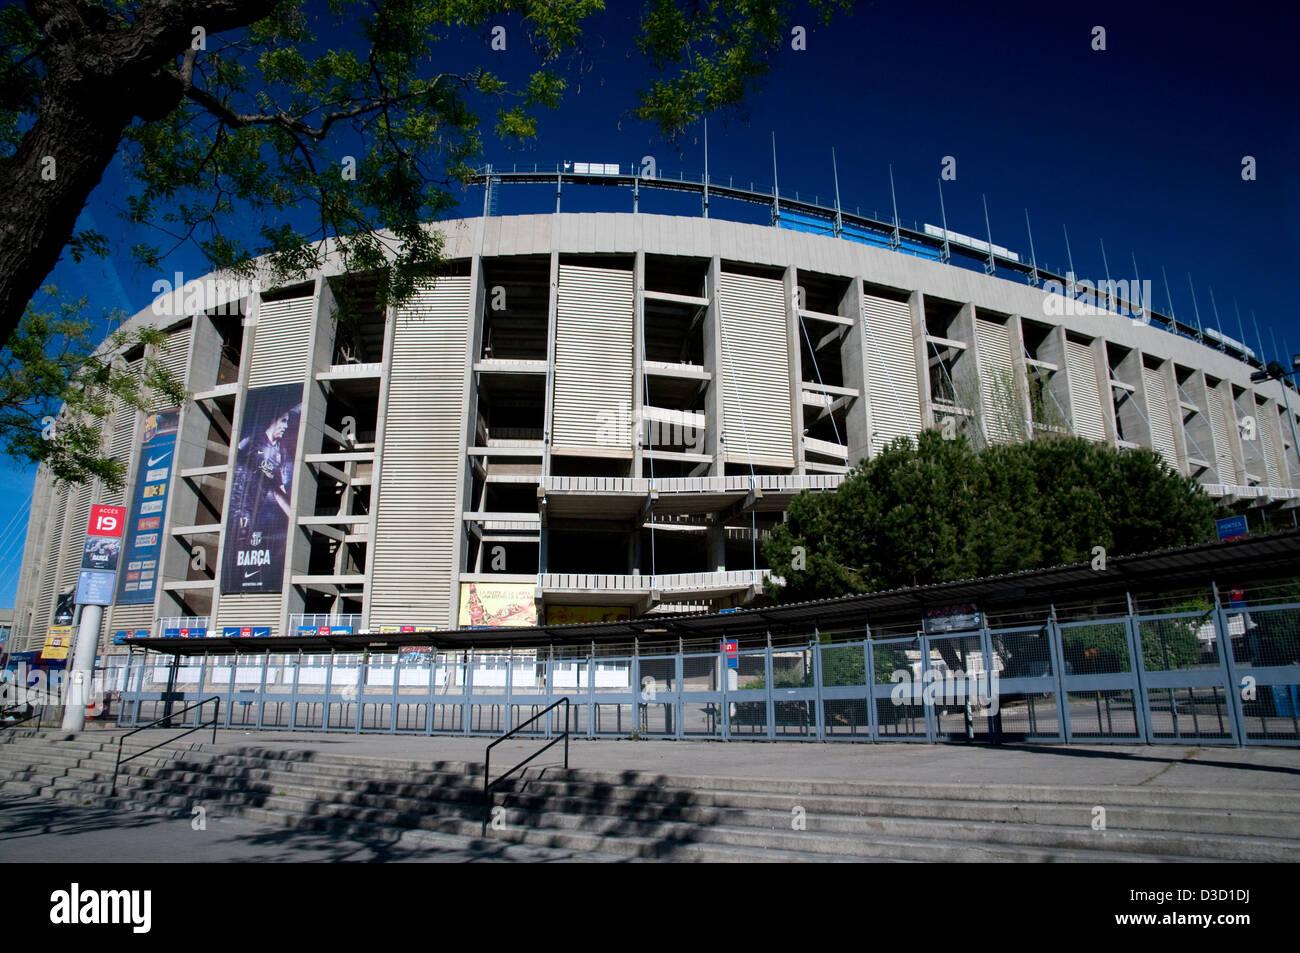 camp nou stadium,fcb,barcelona,catalunya,spain - Stock Image